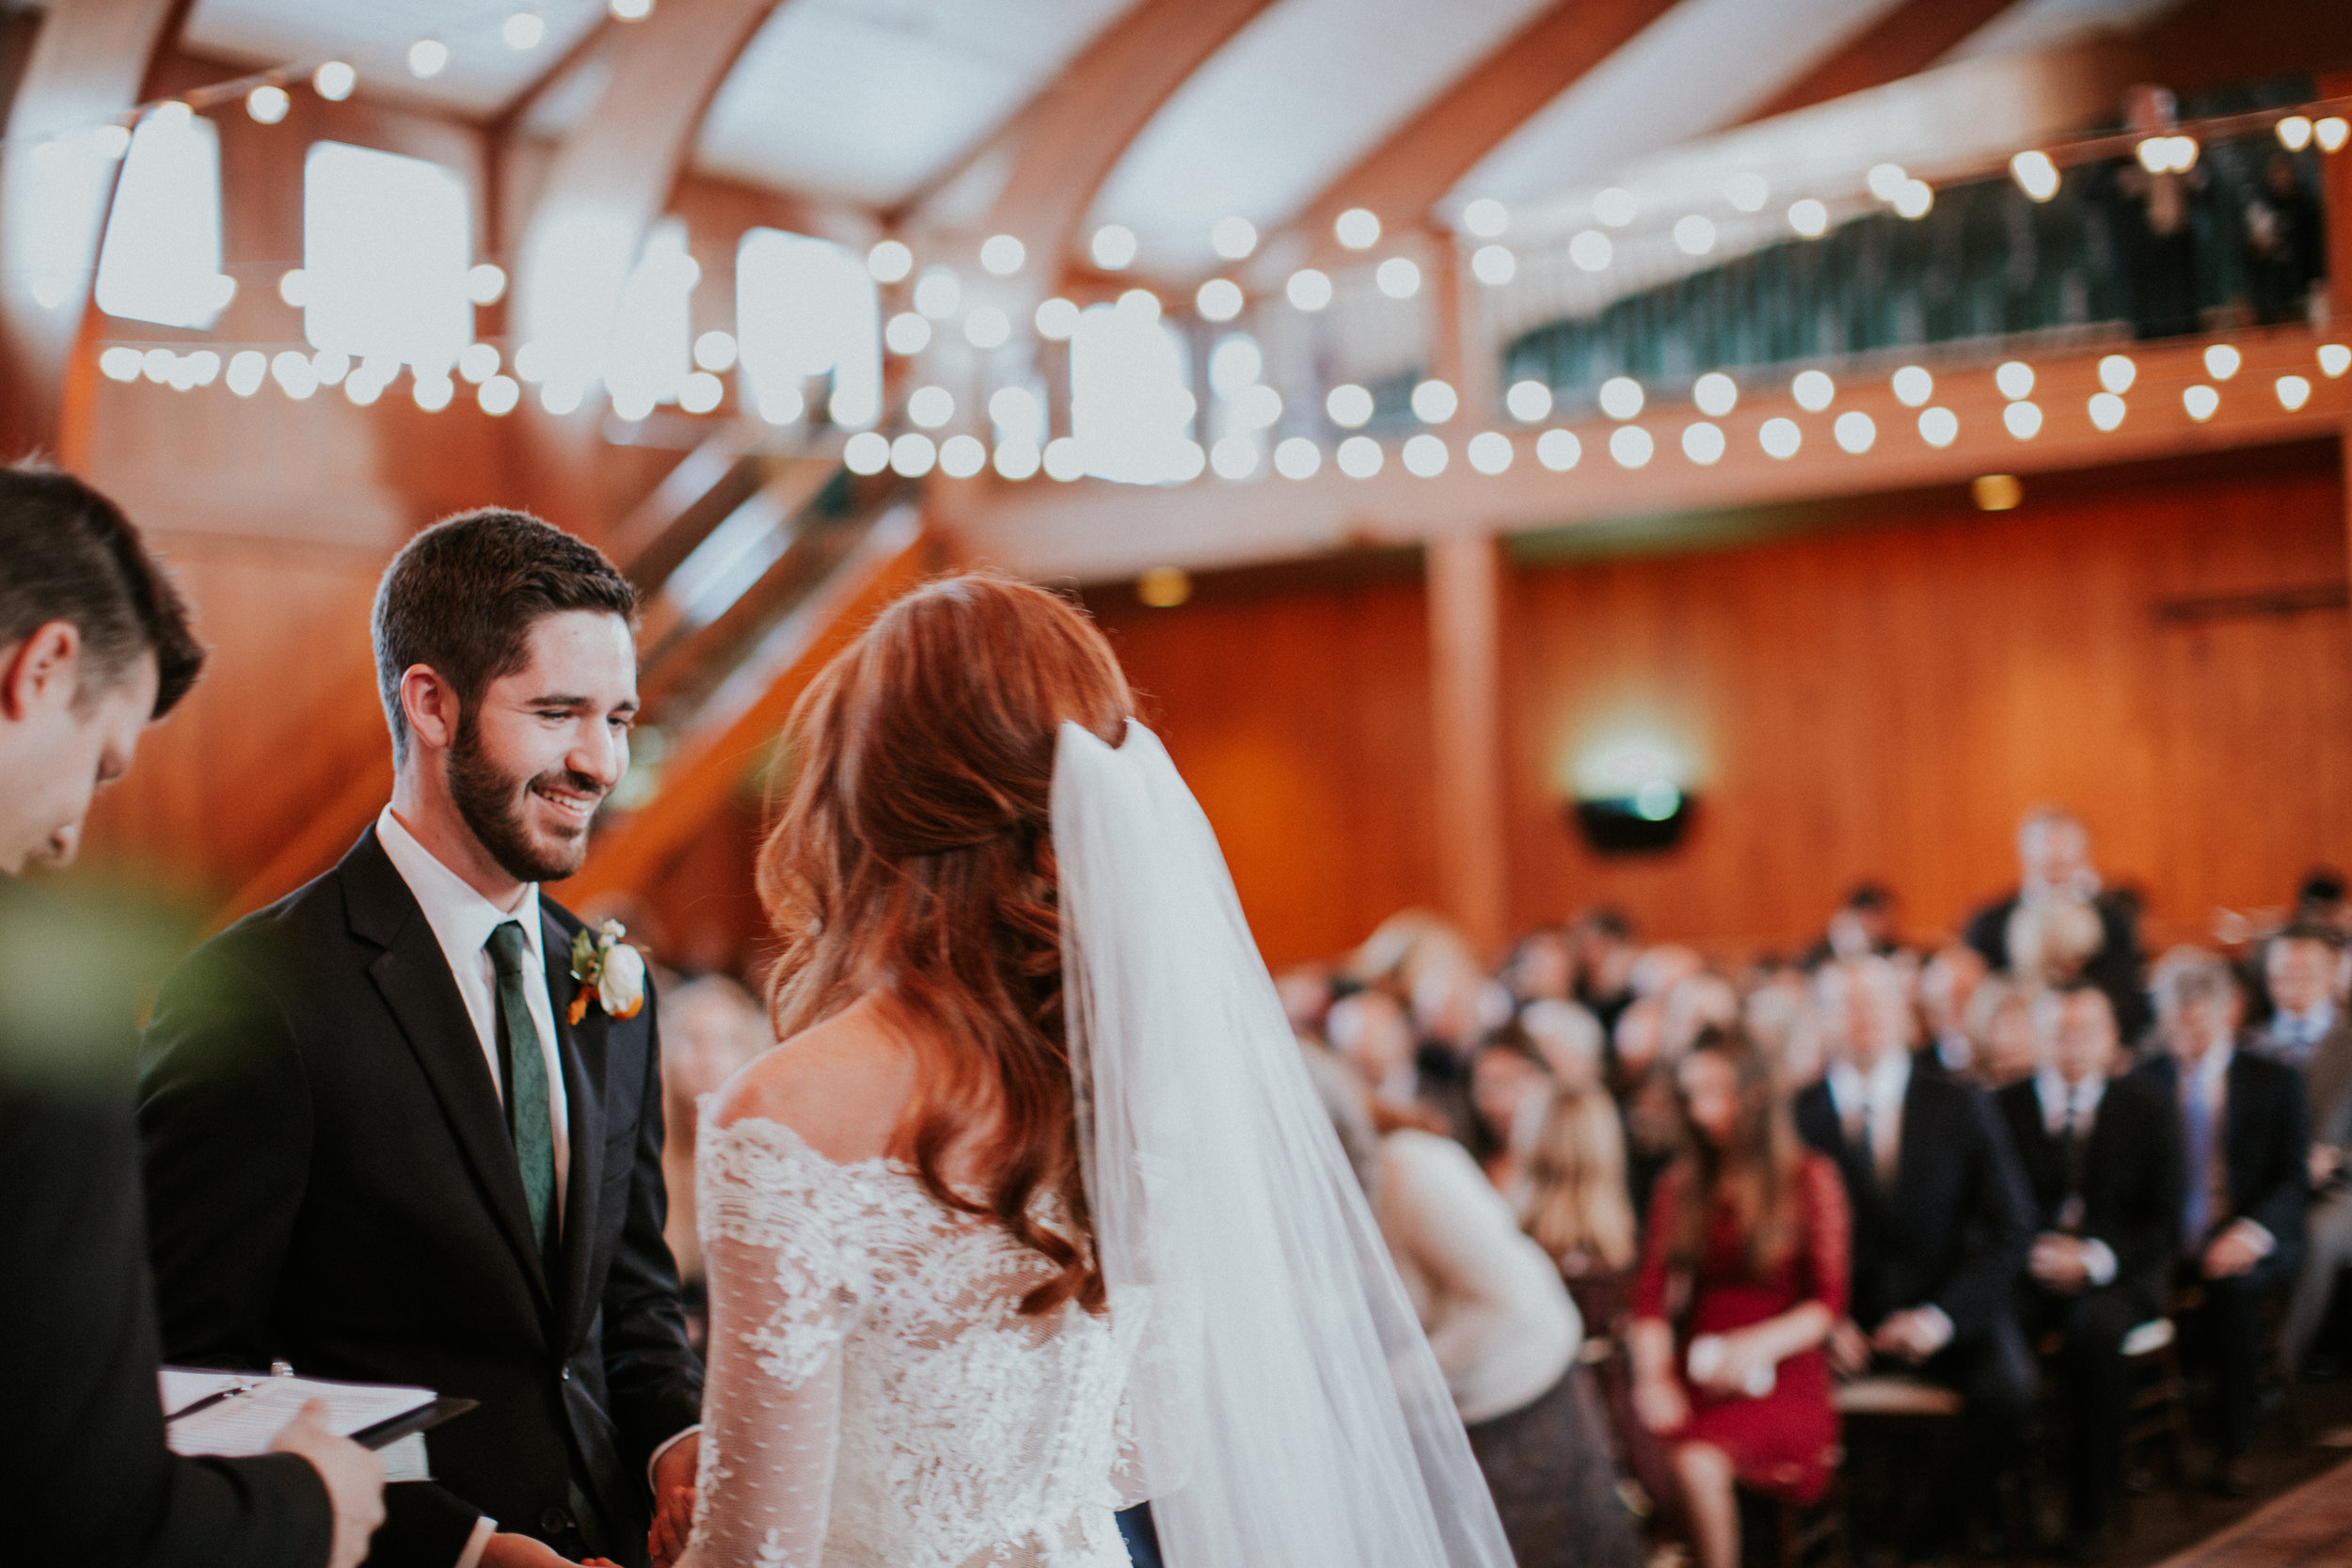 weddingceremonyabbymortensonphotography.jpg